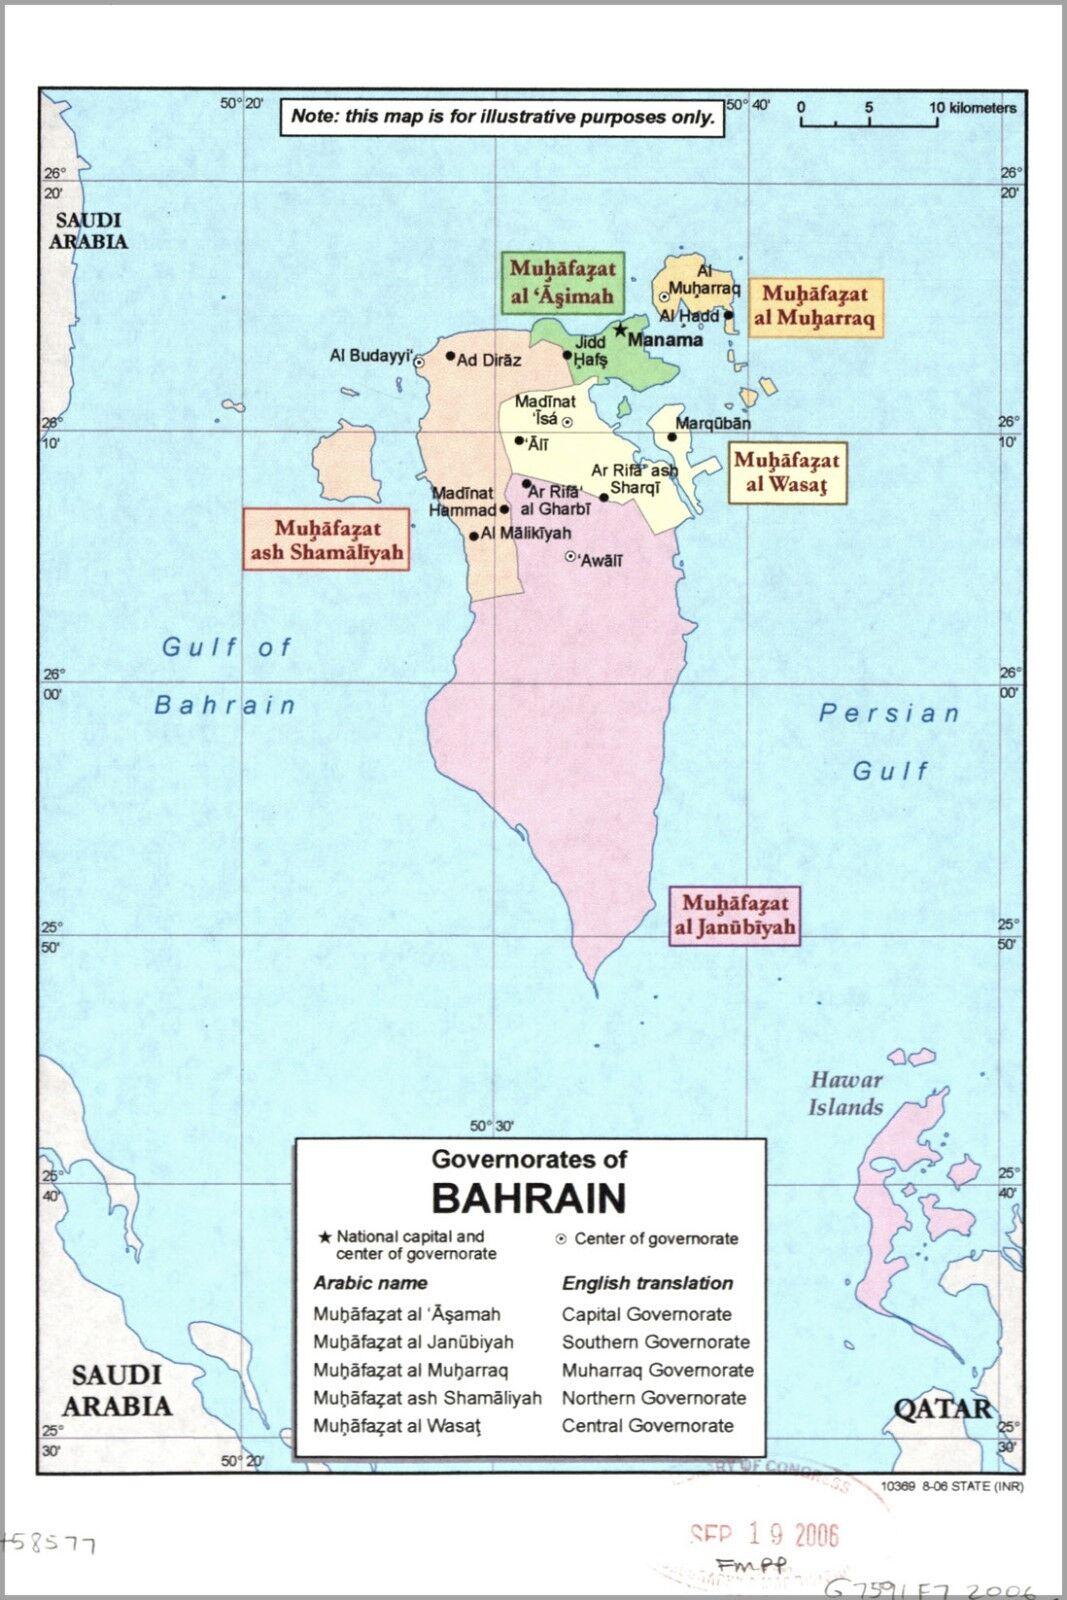 Poster, Misure; Molte Misure; Poster, Governorates di Bahrein 2006 12c8f6